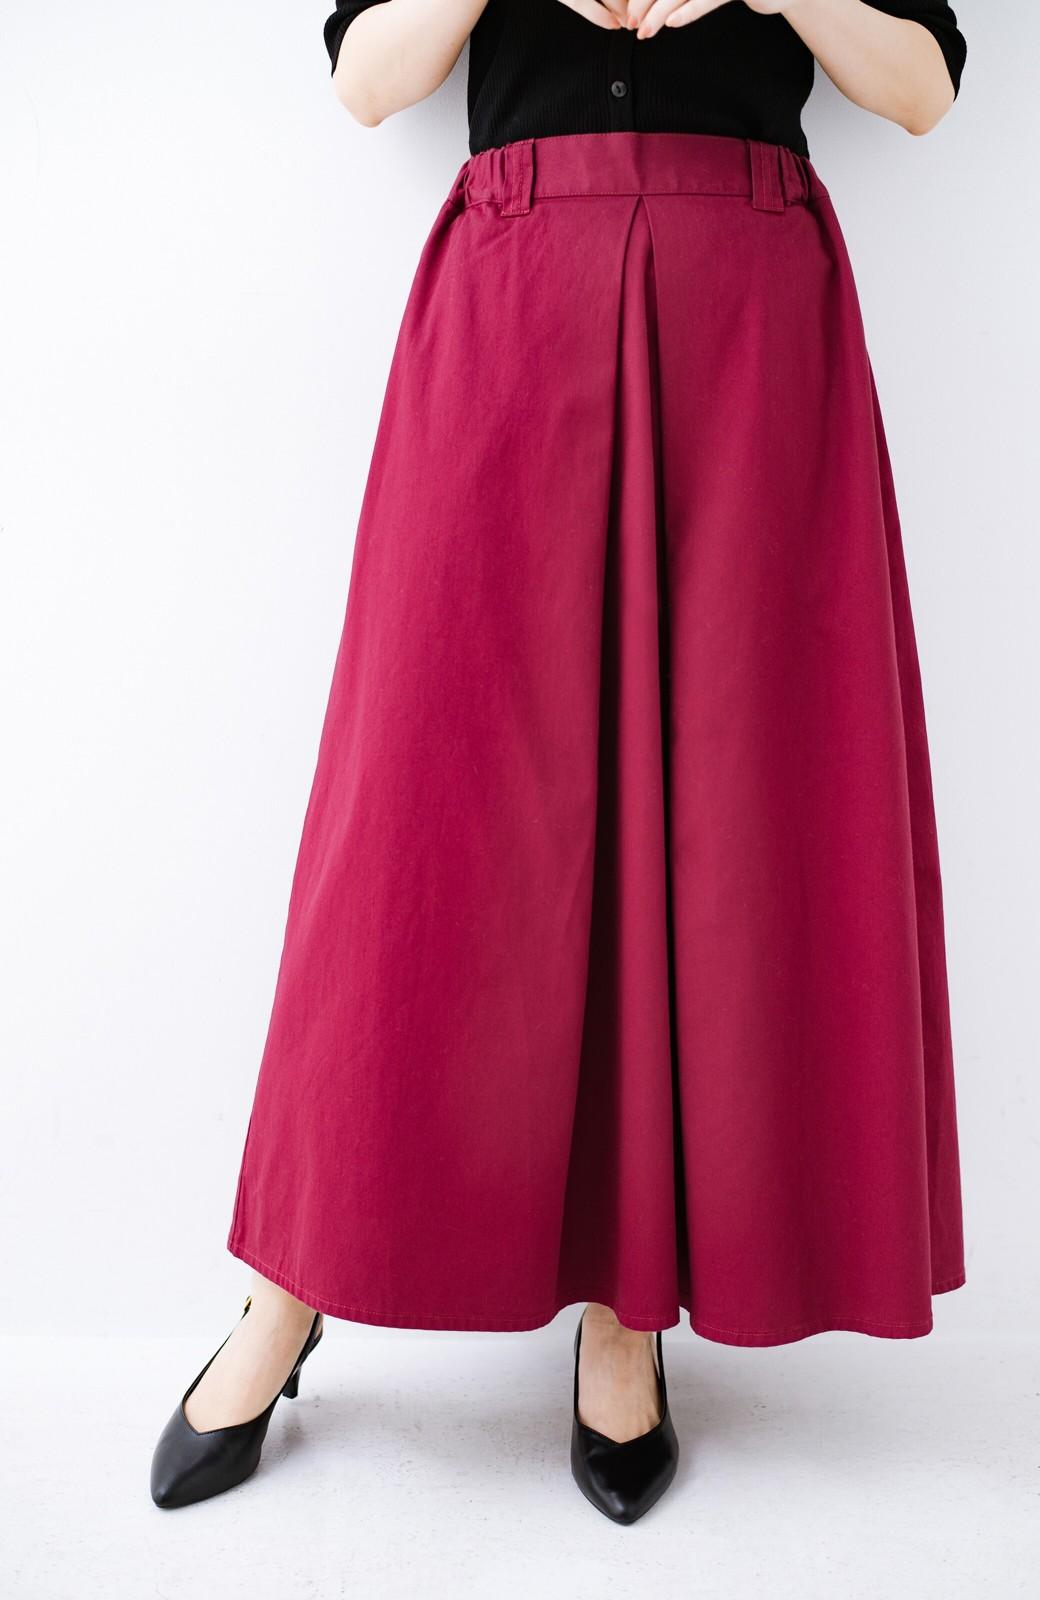 haco! ロングシーズン楽しめる タックボリュームのチノロングスカート <パープル>の商品写真1